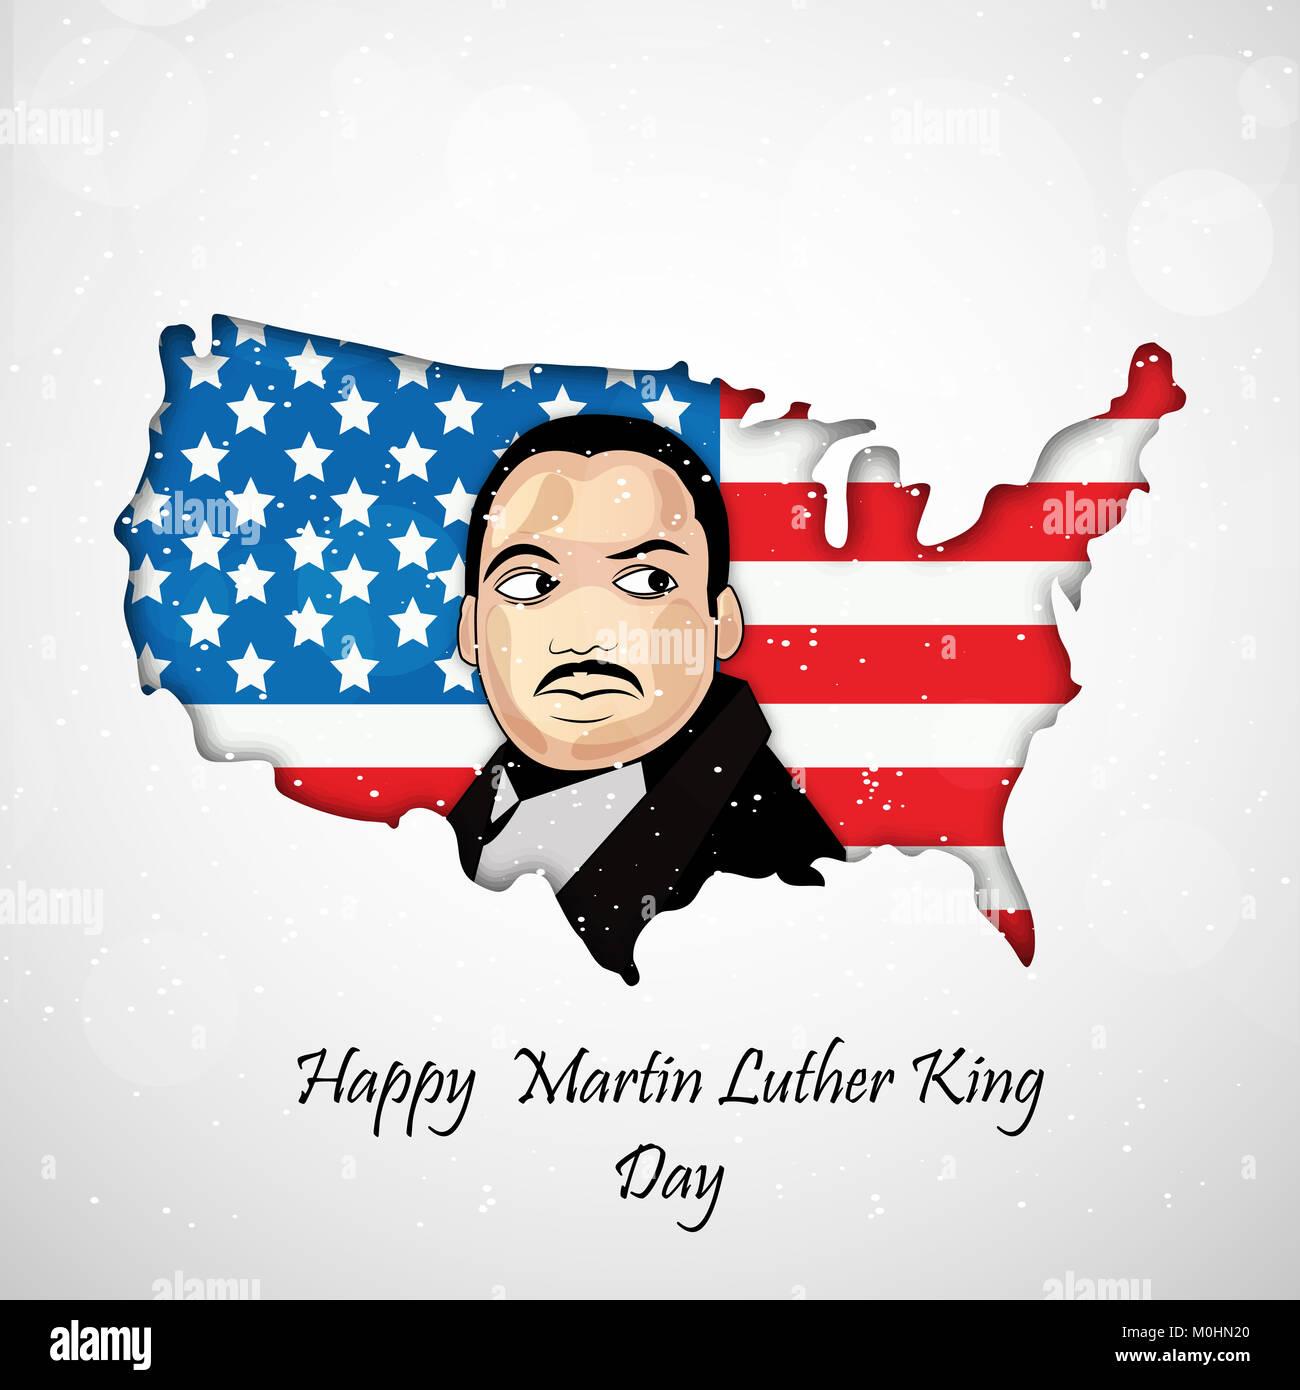 Abbildung: Martin Luther King Tag Hintergrund Stockfoto, Bild ...